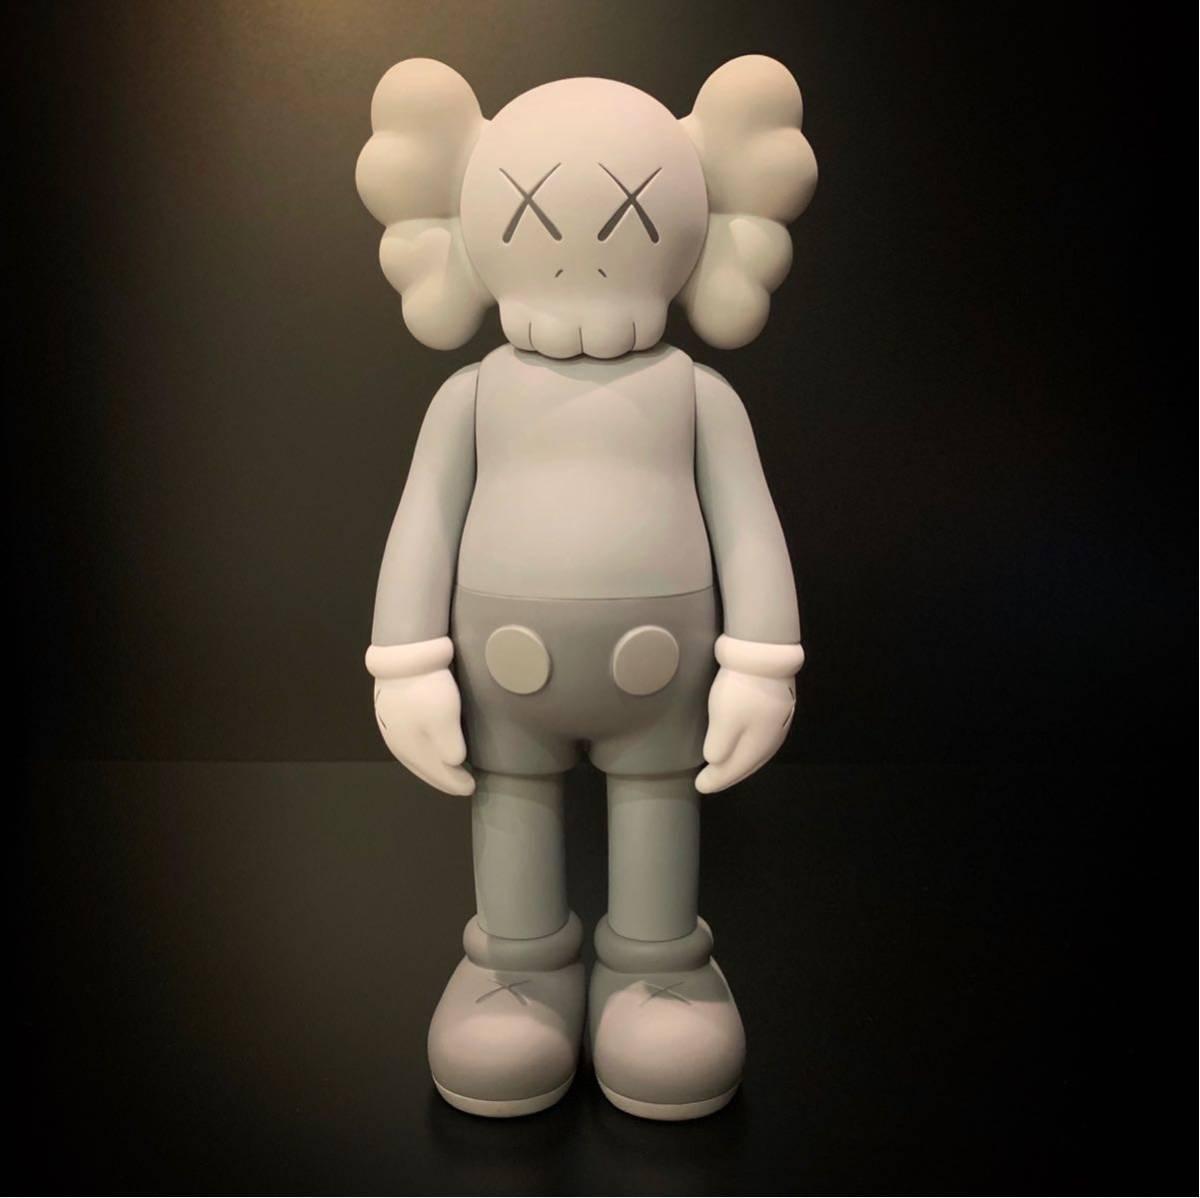 Toy Plus限定 MEDICOM TOY KAWS COMPANION OPEN EDITION / GREY / ベアブリック カウズ フィギュア拍卖